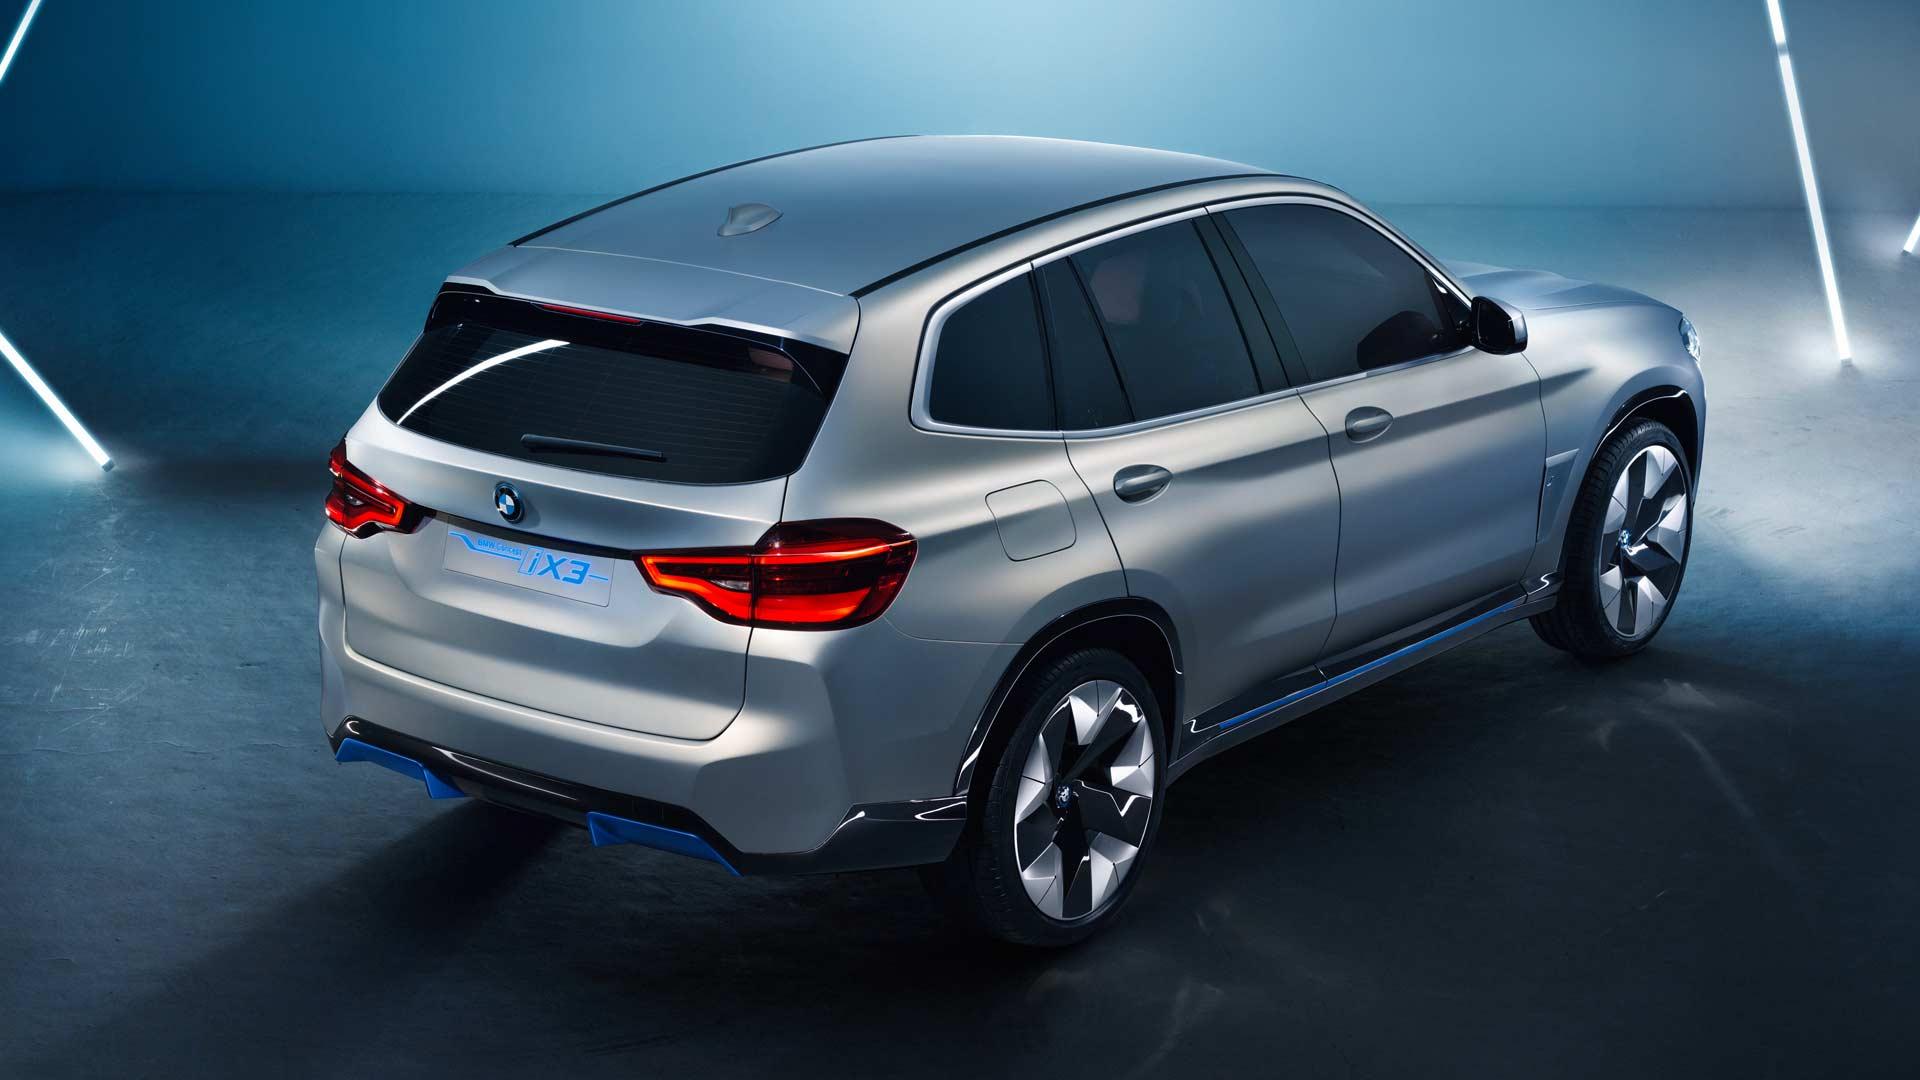 BMW-Concept-iX3_4